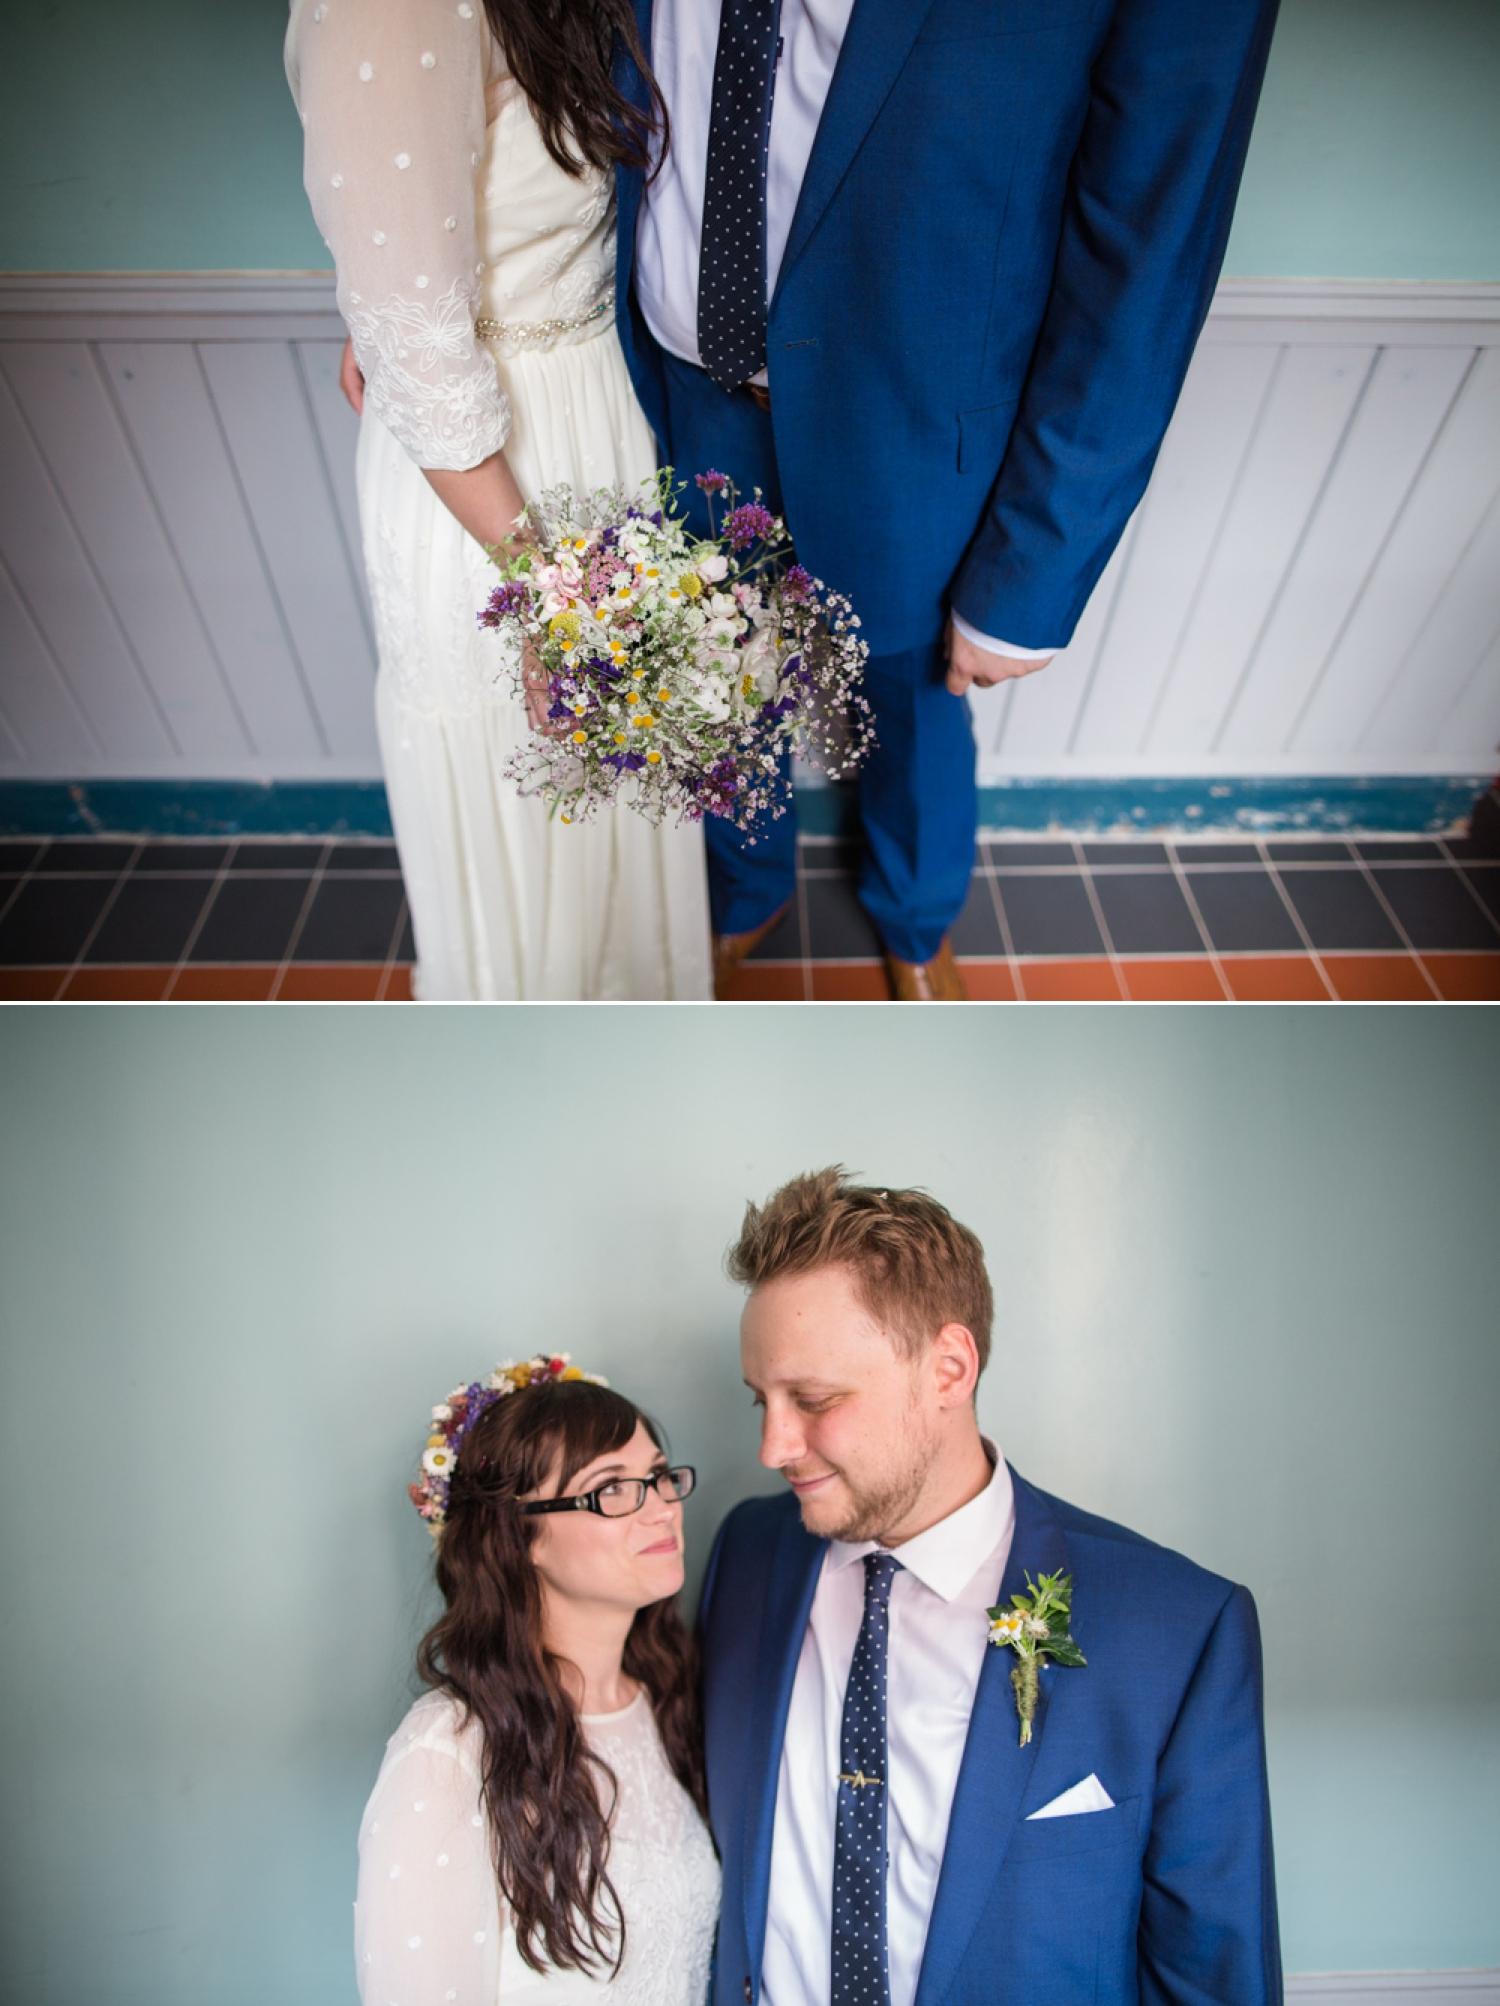 Cheshire Wedding Photographer Elly & Liam_0022